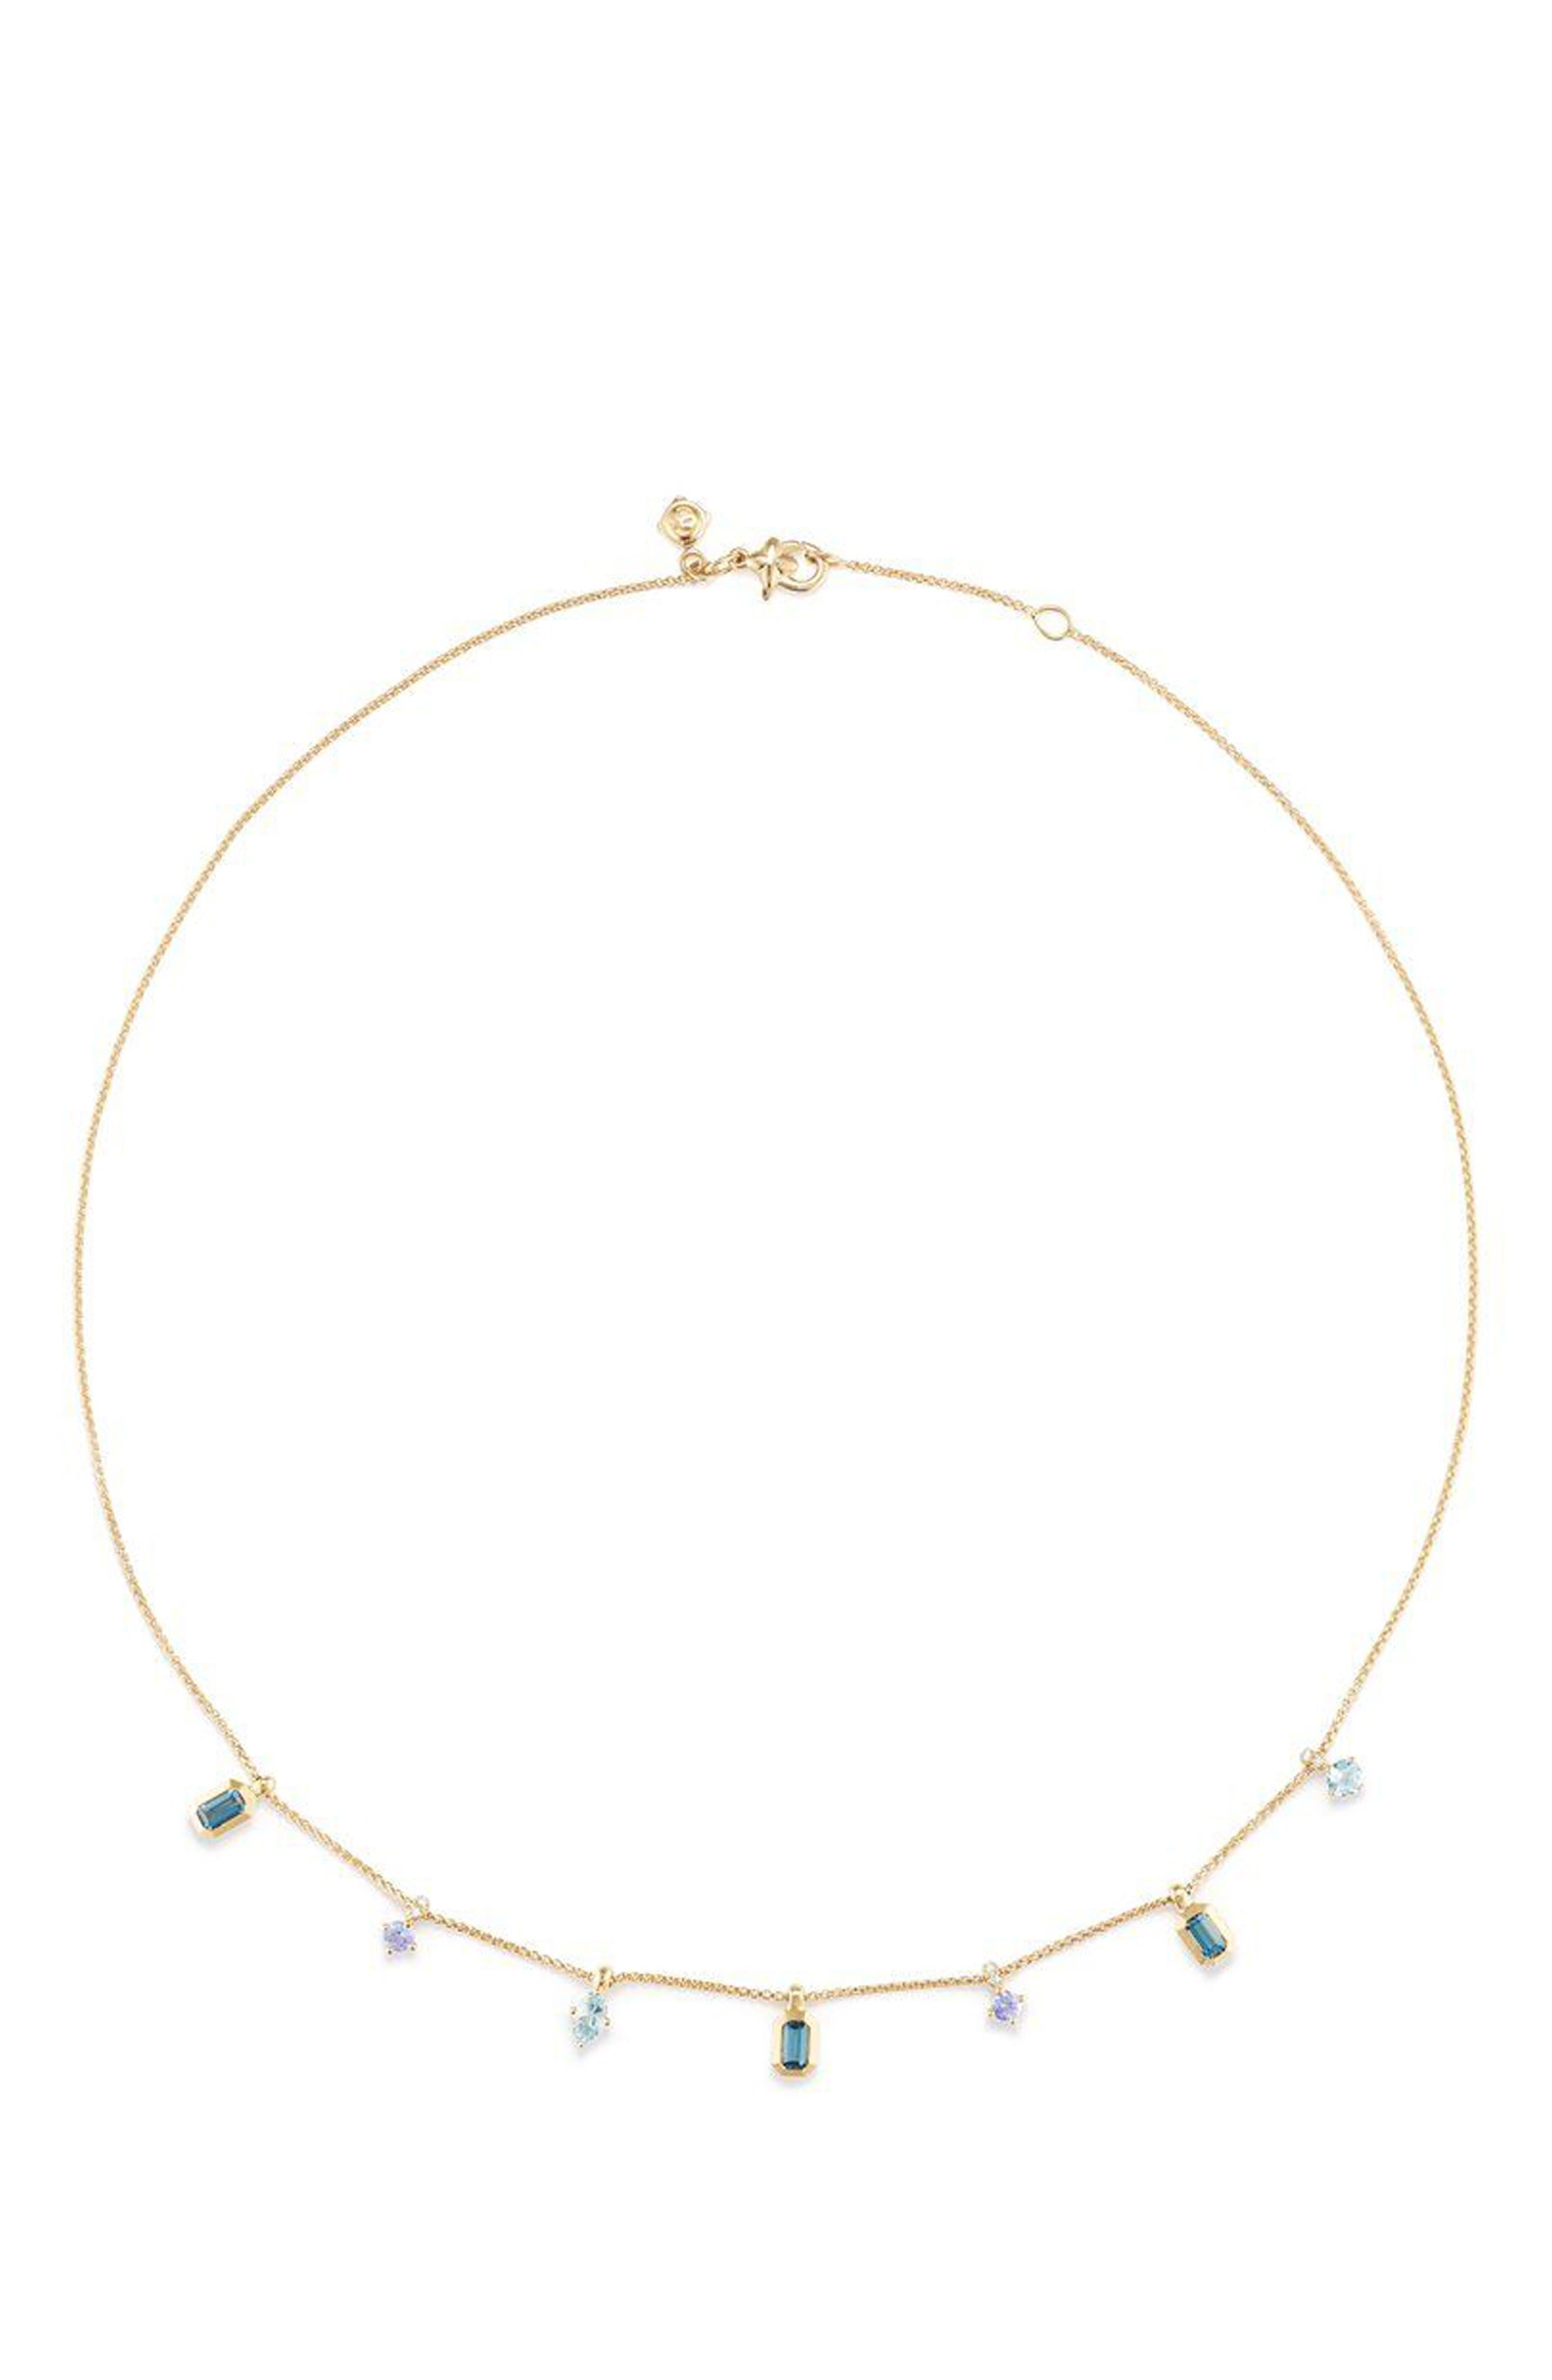 Novella Necklace in 18K Gold,                         Main,                         color, Gold/ Diamond/ Blue Topaz